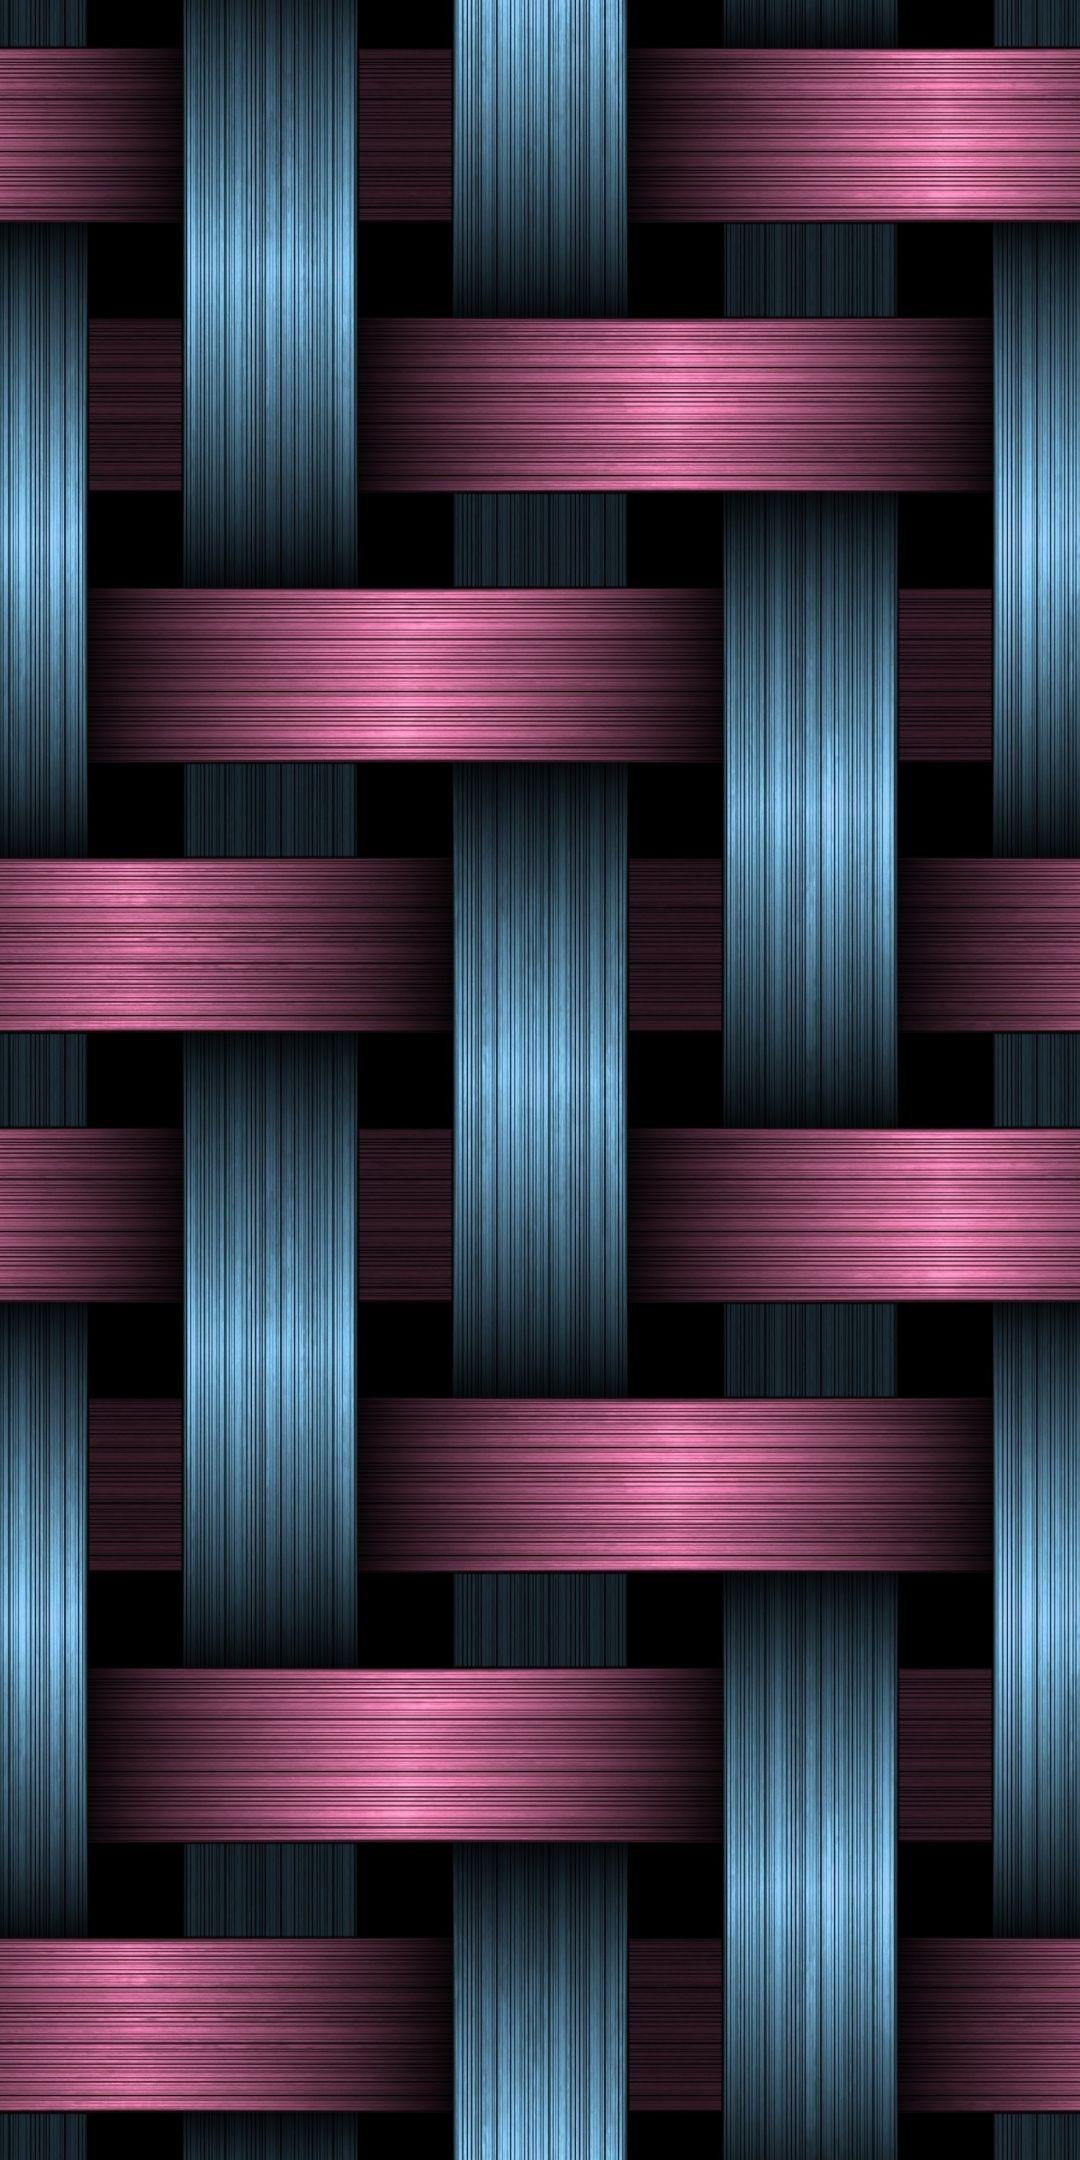 Purple-pink stripes, overlap, pattern, 1080x2160 wallpaper